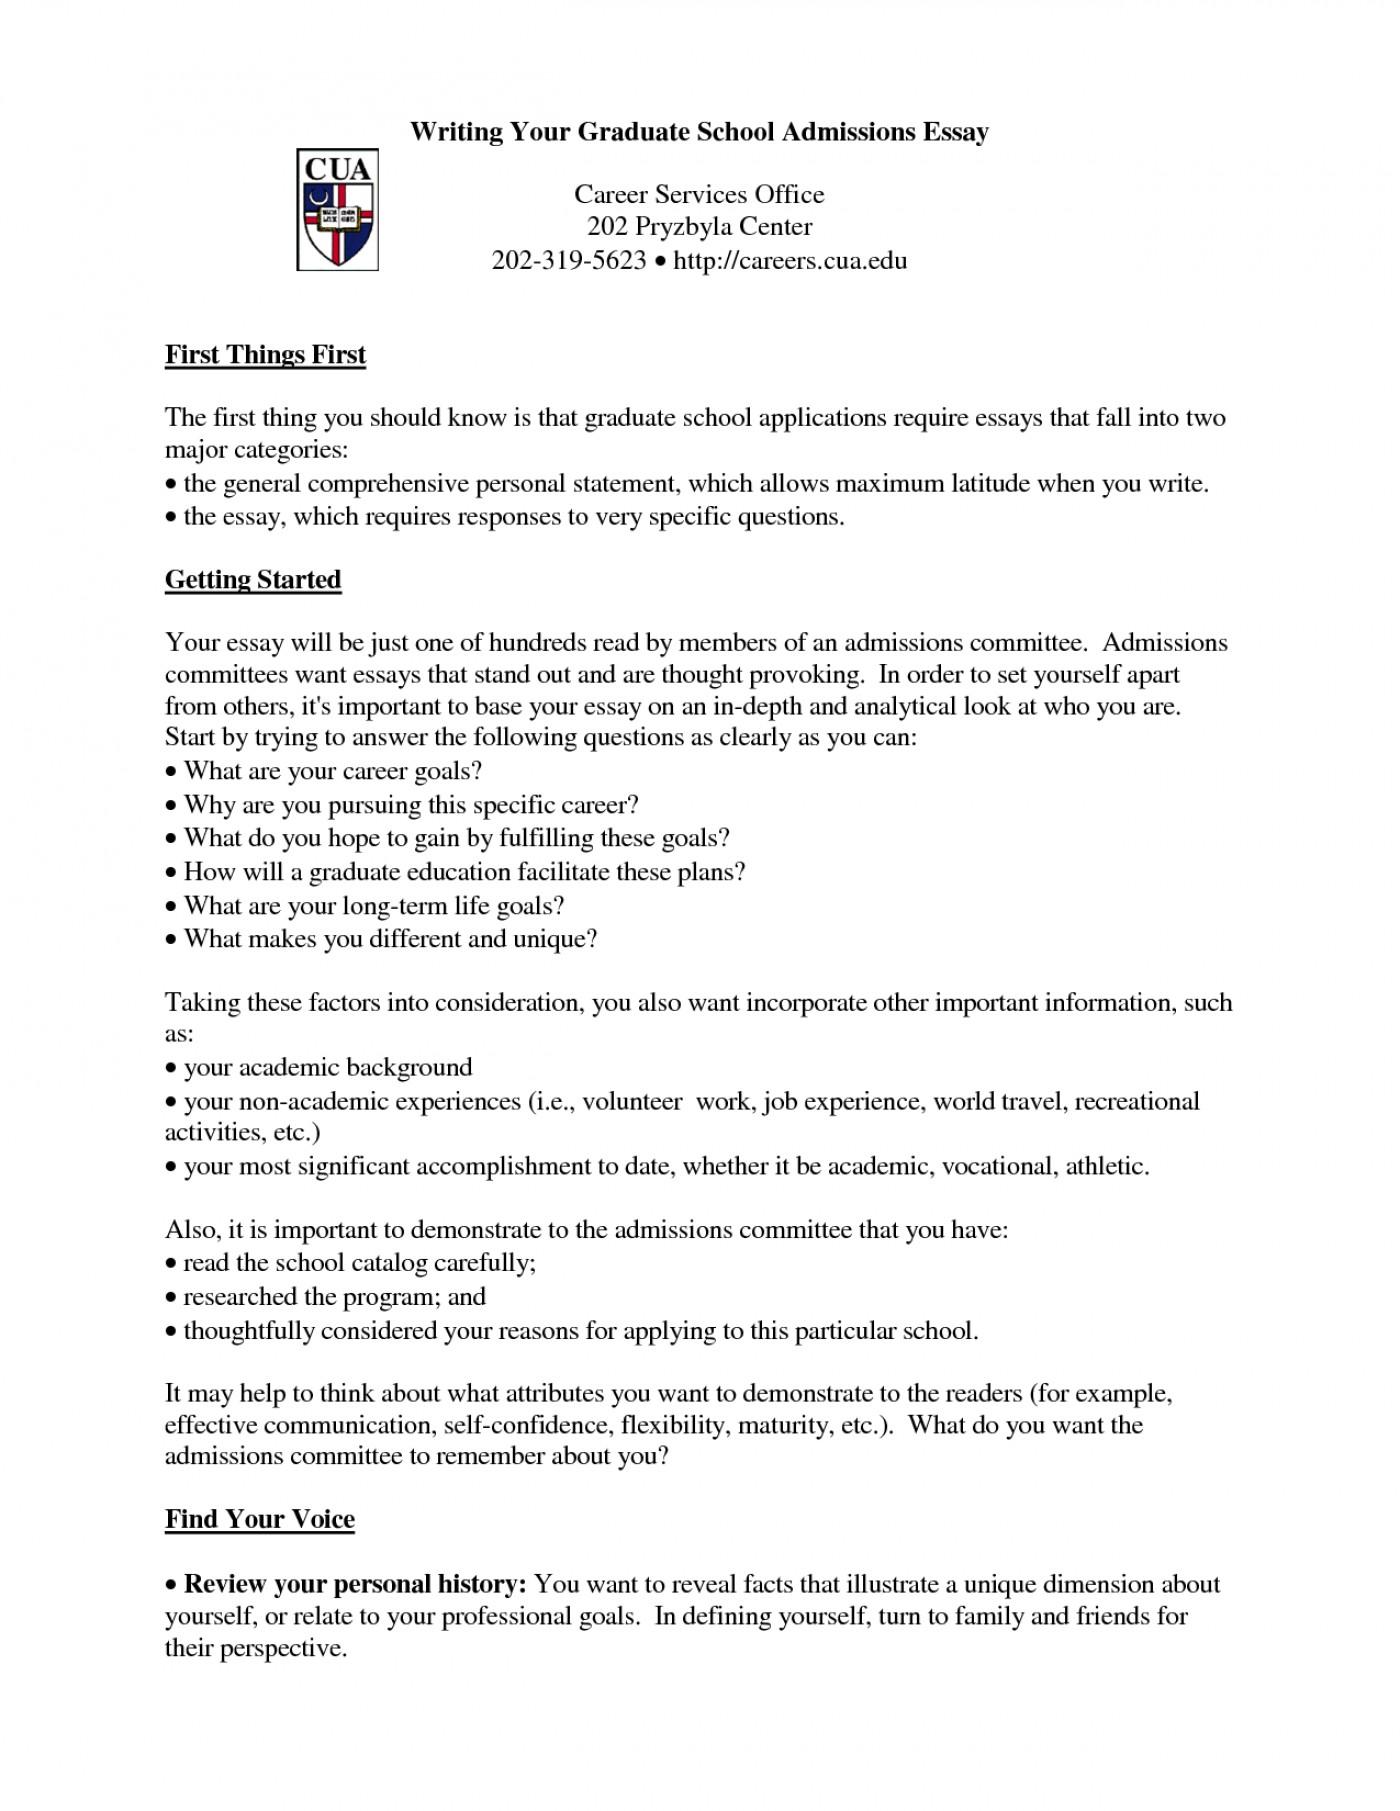 002 Essay Example Free Sample For Graduate School Admission Formidable Pdf 1400